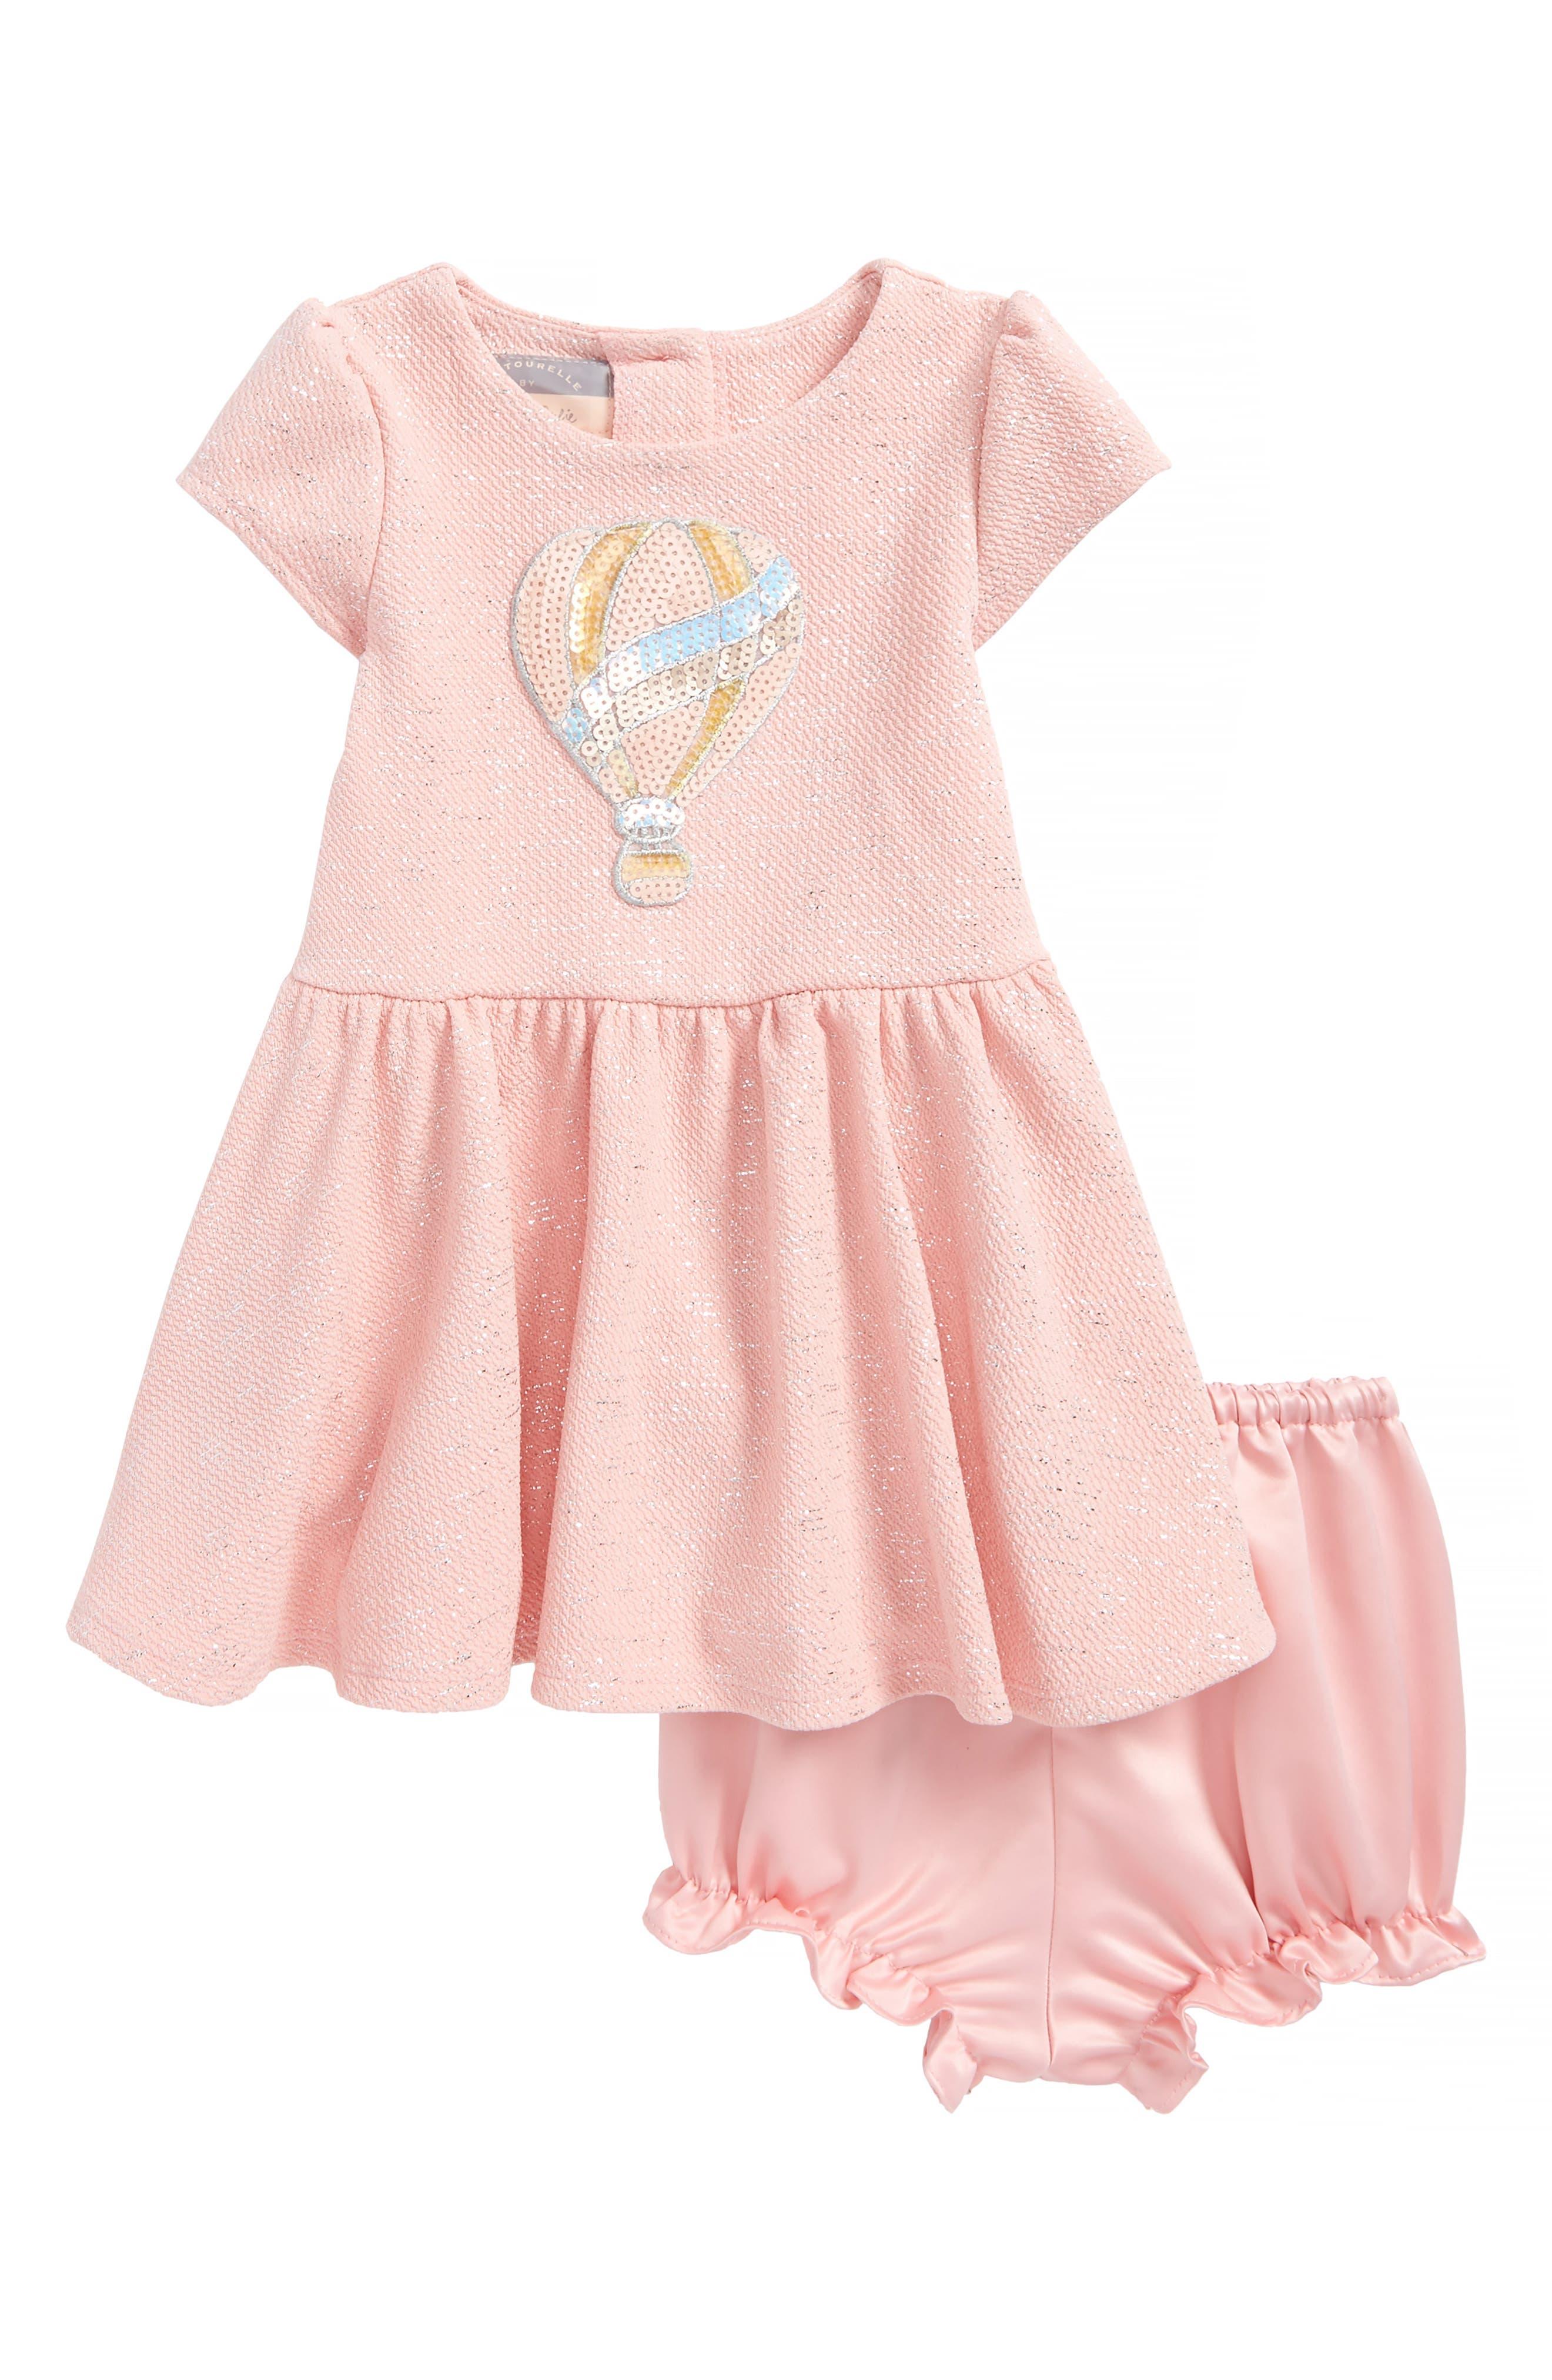 Sequin Balloon Skater Dress,                             Main thumbnail 1, color,                             Pink